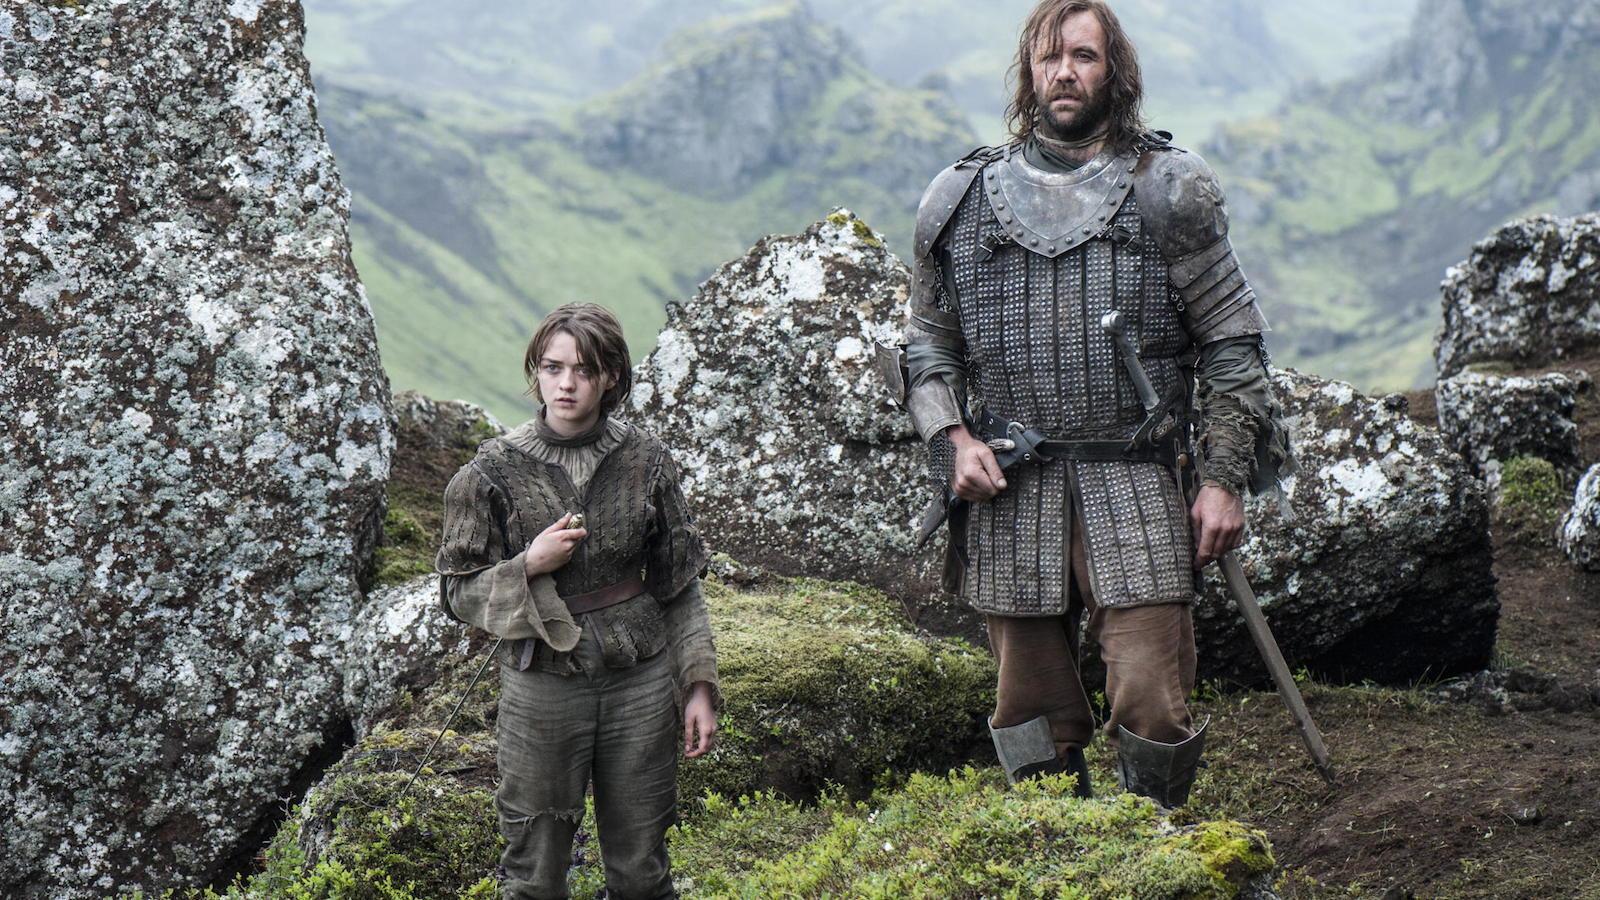 Cast of Thrones Season 4 Episode 10: The ChildrenGame Of Thrones Cast Season 4 Cast